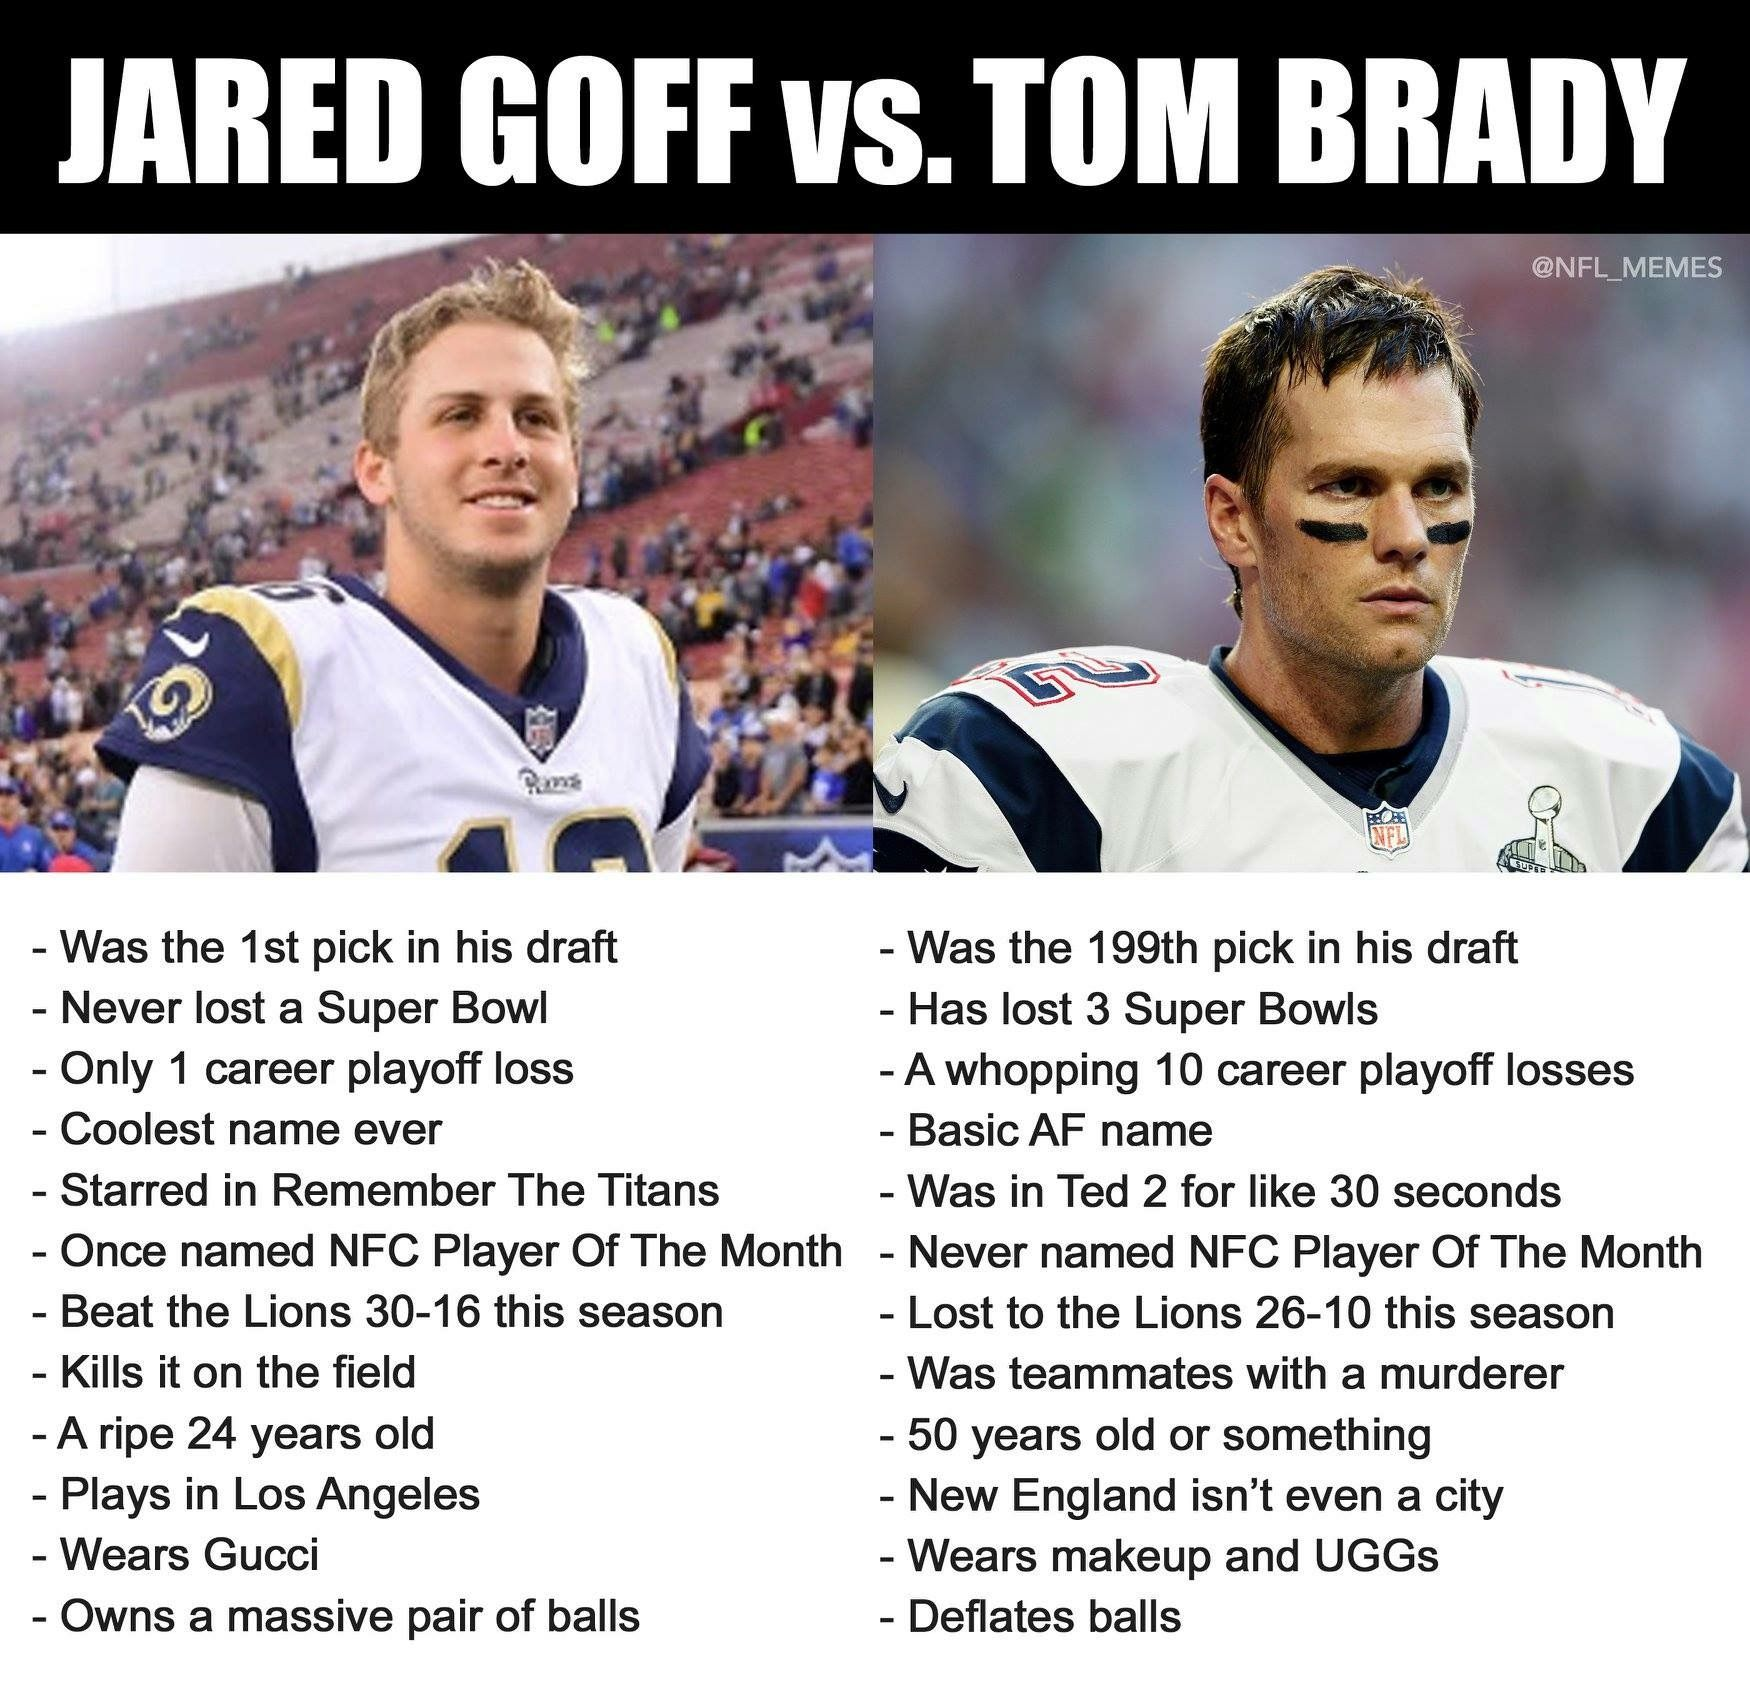 Pin By April Addington On Nfl Memes Jared Goff Nfl Memes Tom Brady Nfl